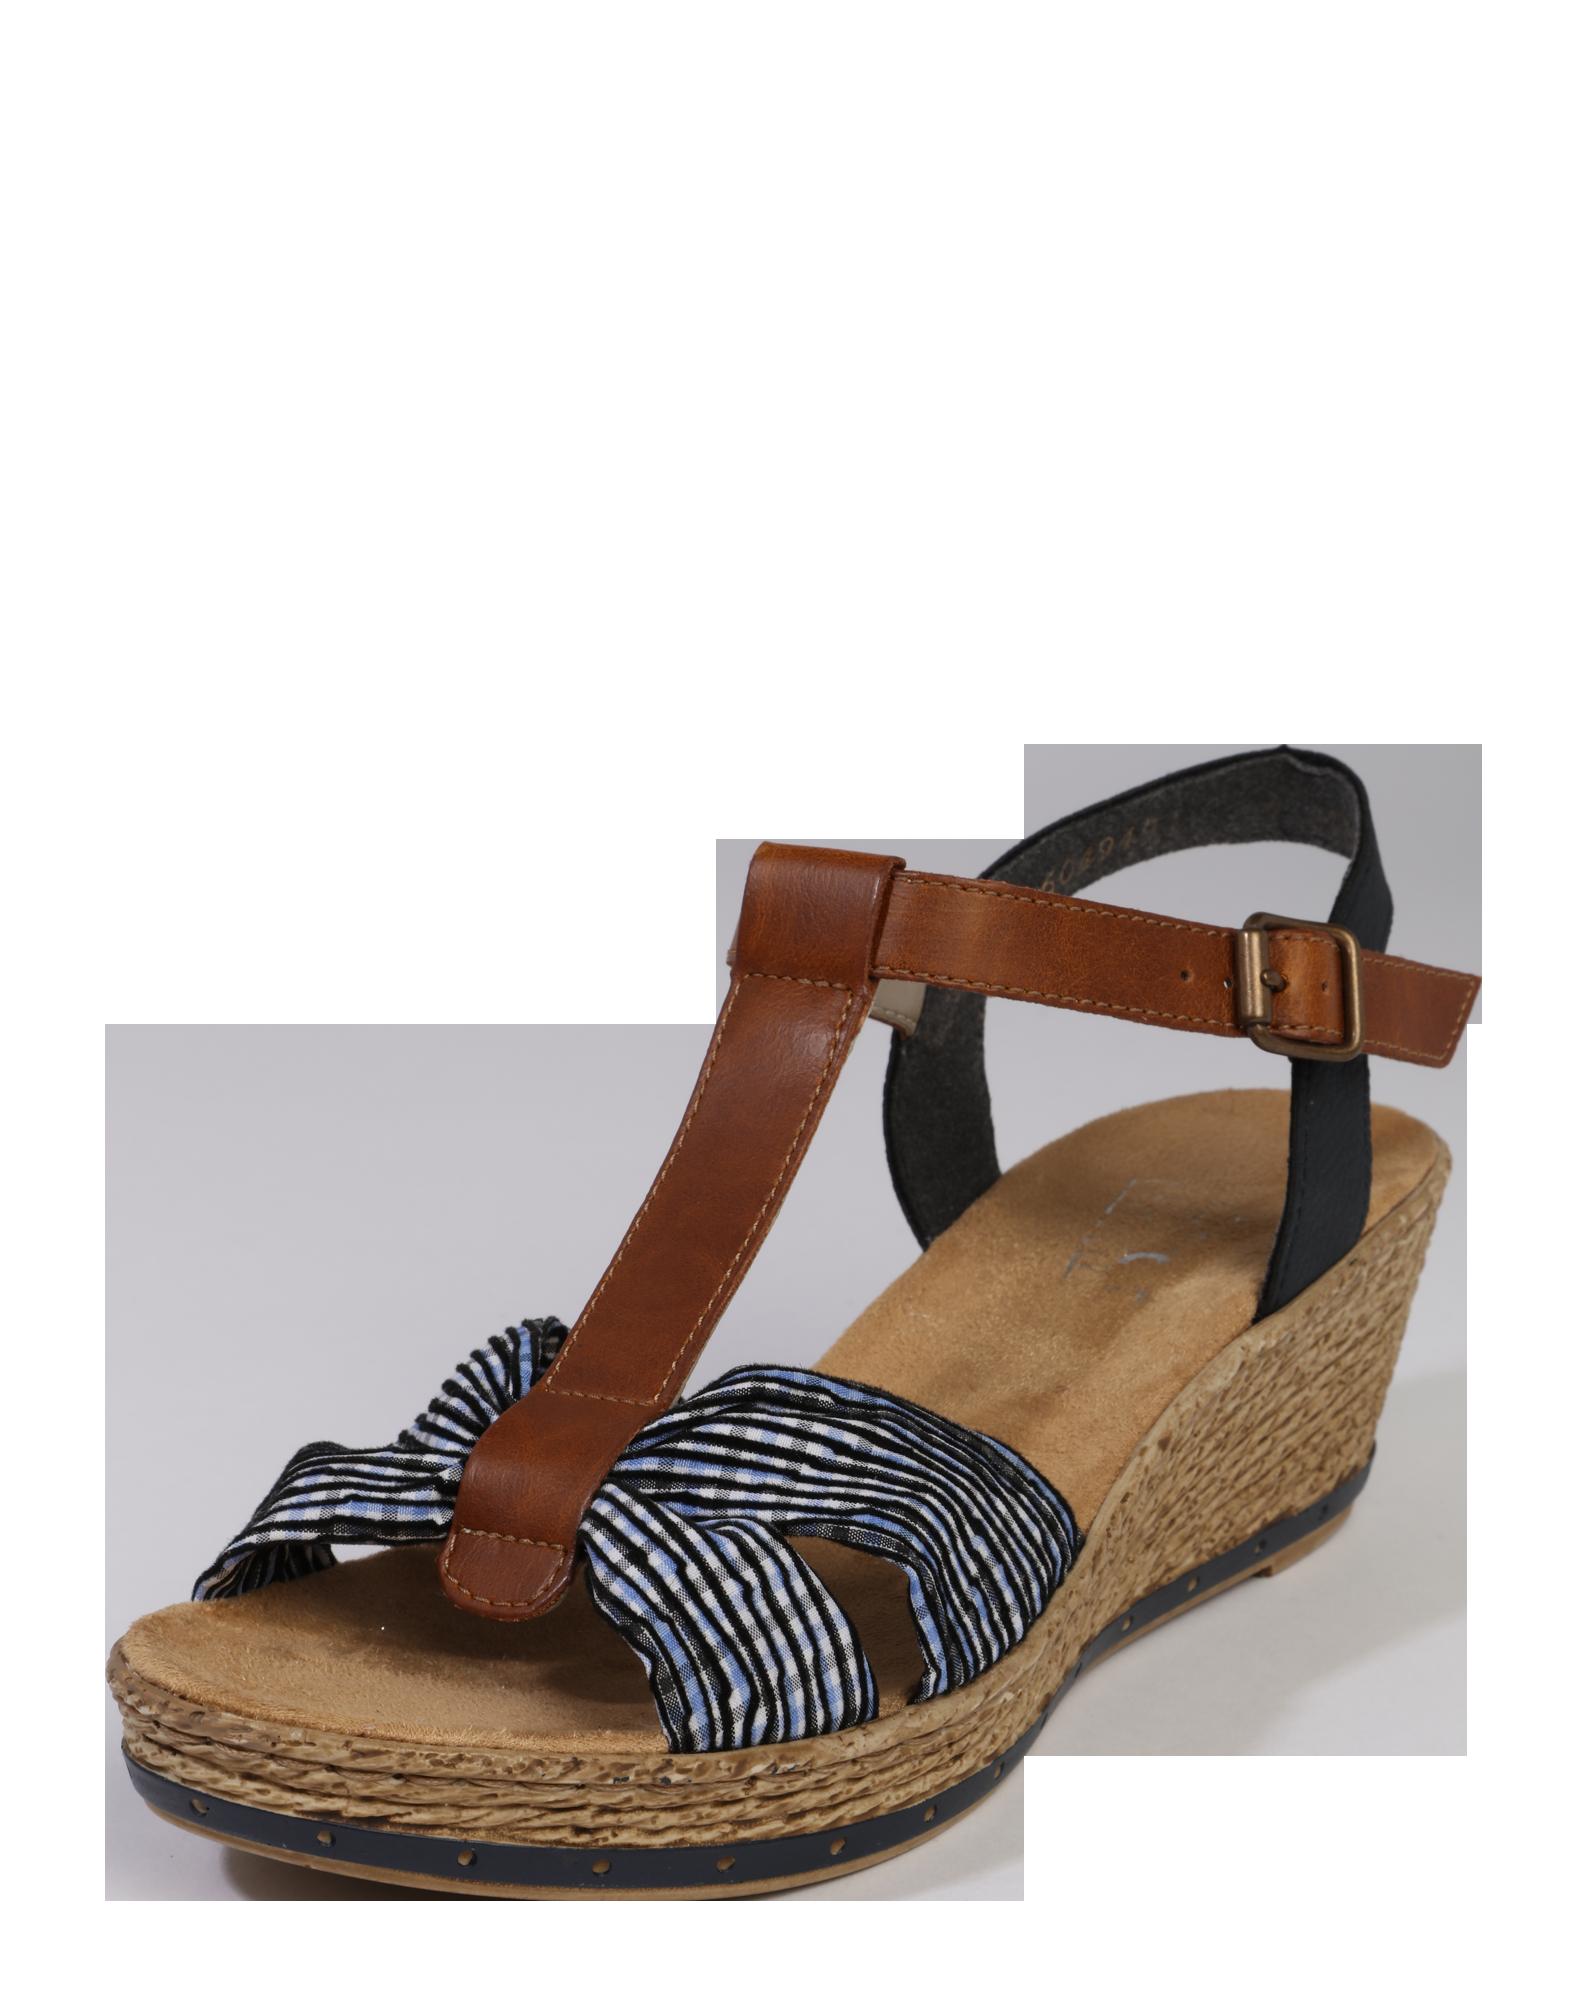 Sandalen Schuhe Damen Rieker Sandale Im Retrolook Blau Braun Ootd Outfit Fashion Style Online Blau Braun Rieker Sandalen Und Sandalen